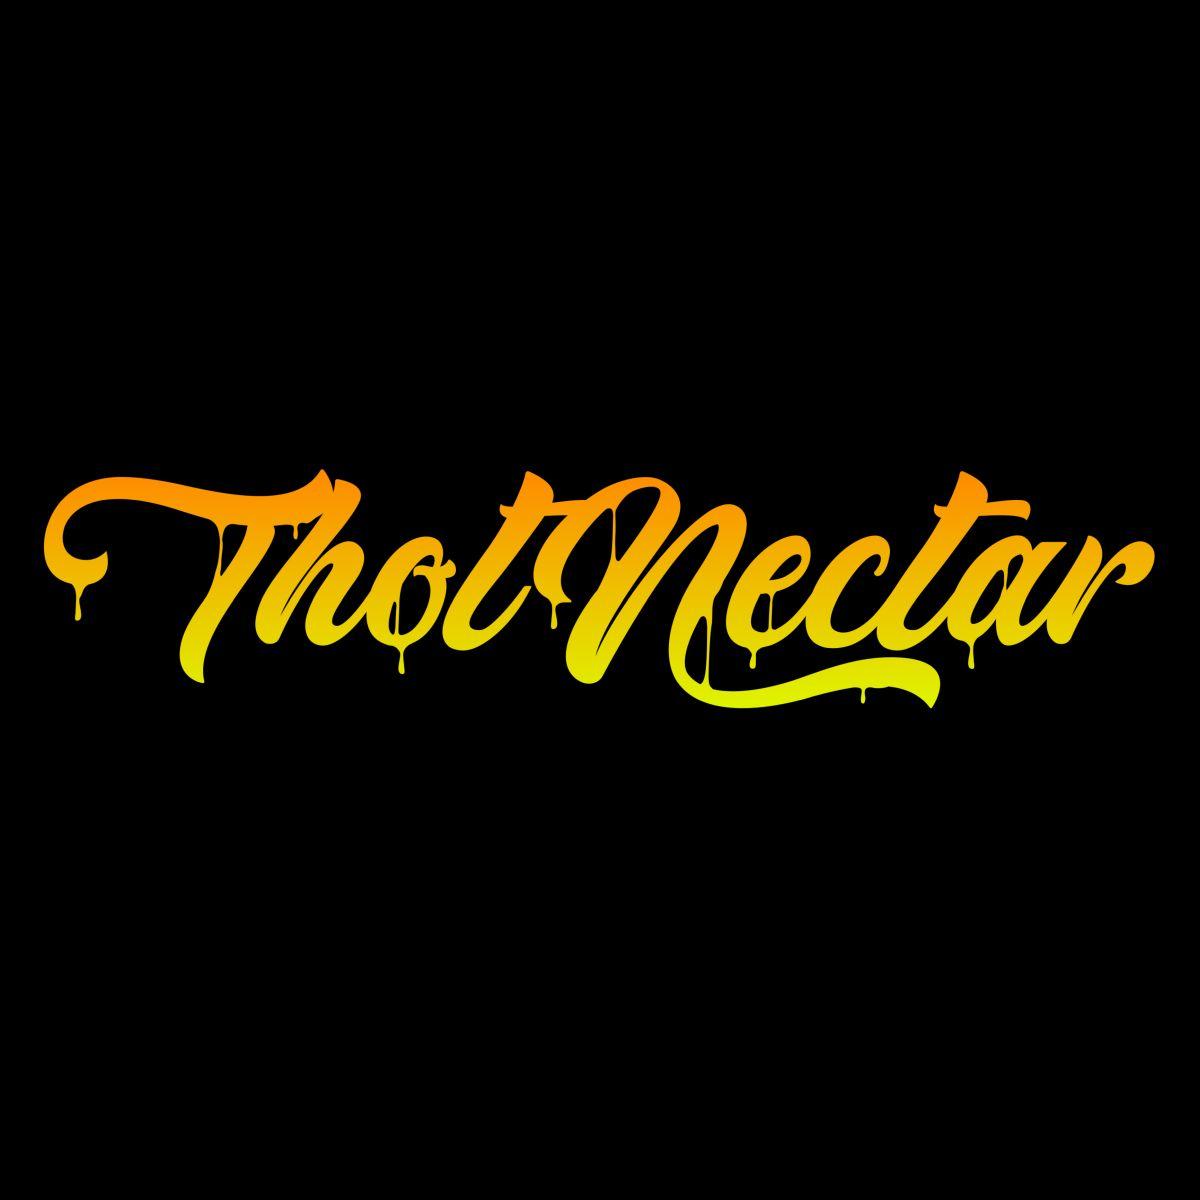 @thotnectar